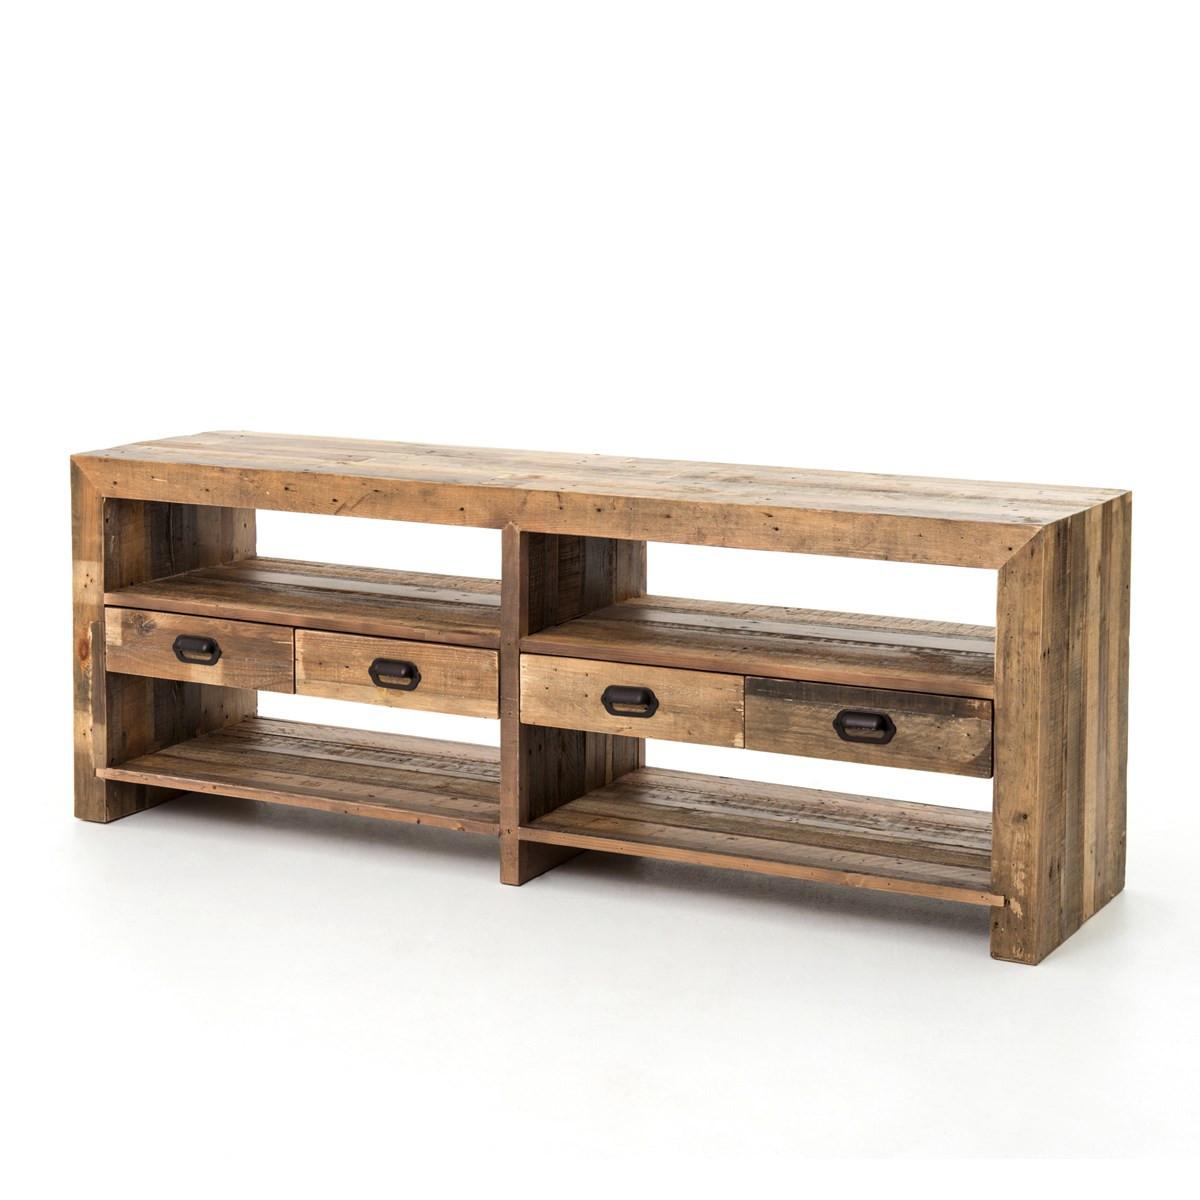 ... Angora Mariposa Reclaimed Wood Rustic Media Console ... - Angora Reclaimed Wood Rustic Media Console With Drawers Zin Home